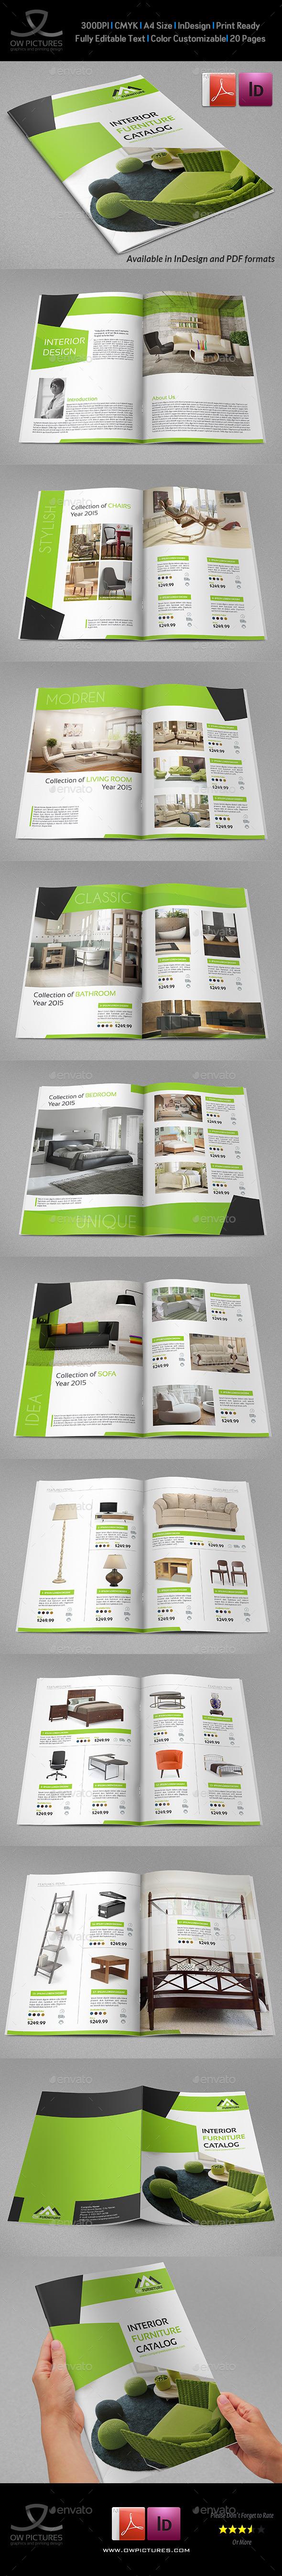 Products Catalogs Brochure - 20 Pages | Catálogo, Ideas y Cosas